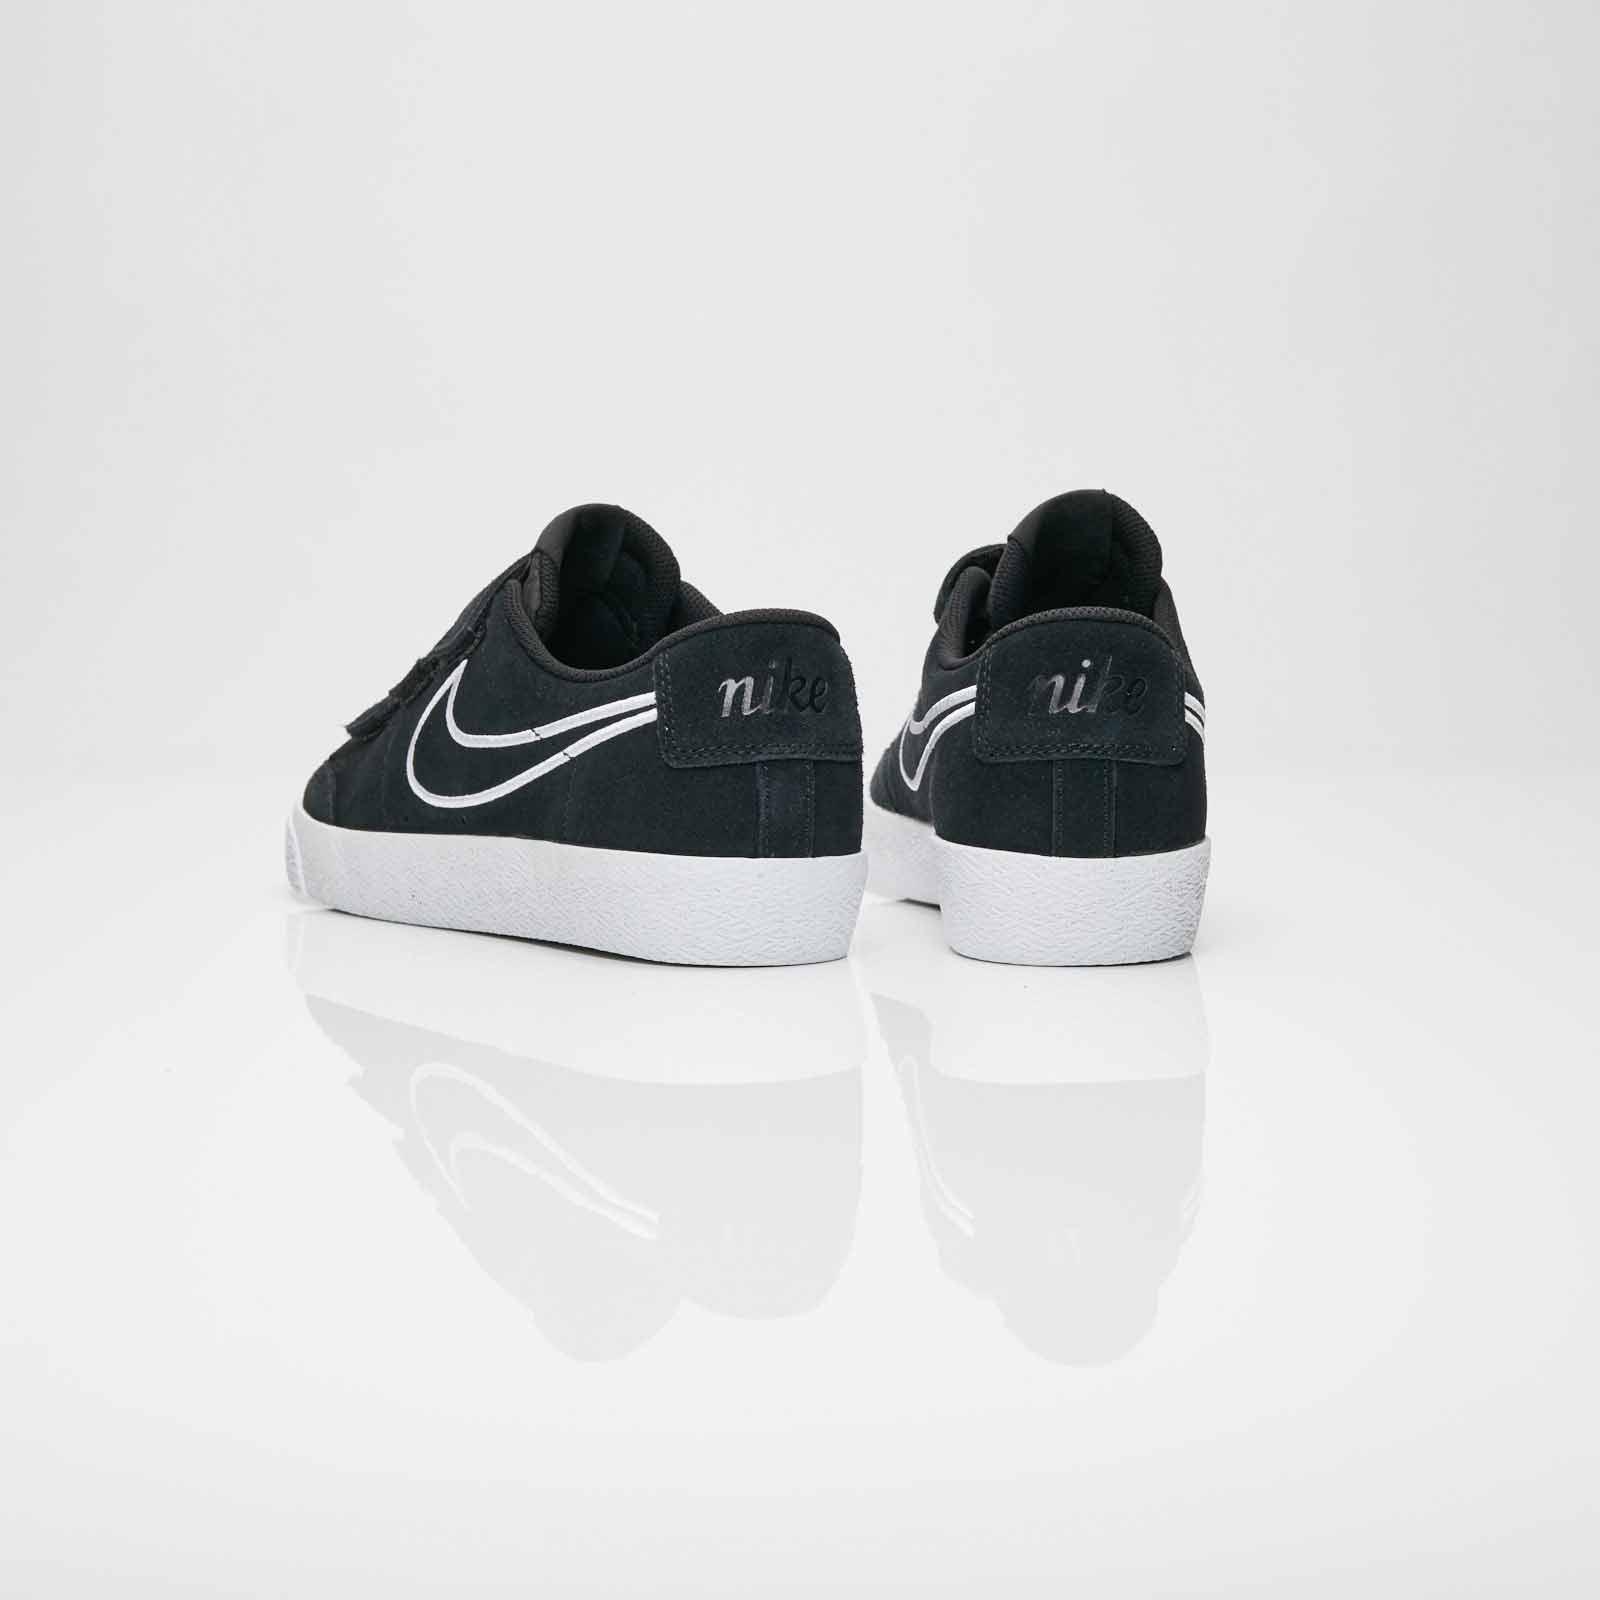 ab11f97619c2 Nike Zoom Blazer AC XT - Ah3434-001 - Sneakersnstuff